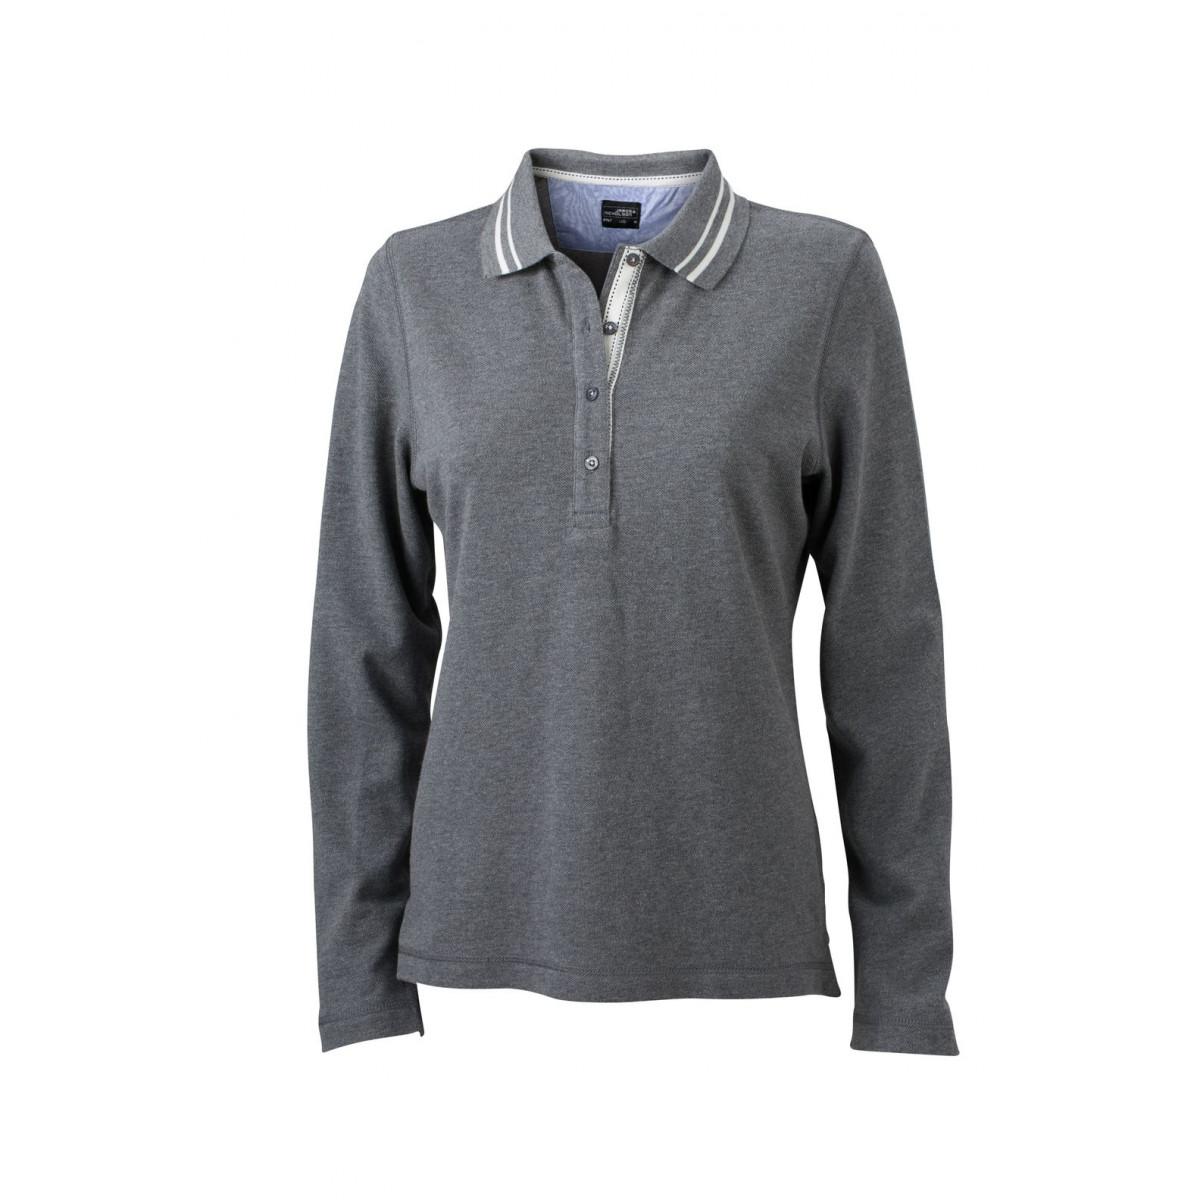 Рубашка поло женская JN967 Ladies Polo Long-Sleeved - Серый меланж/Белый